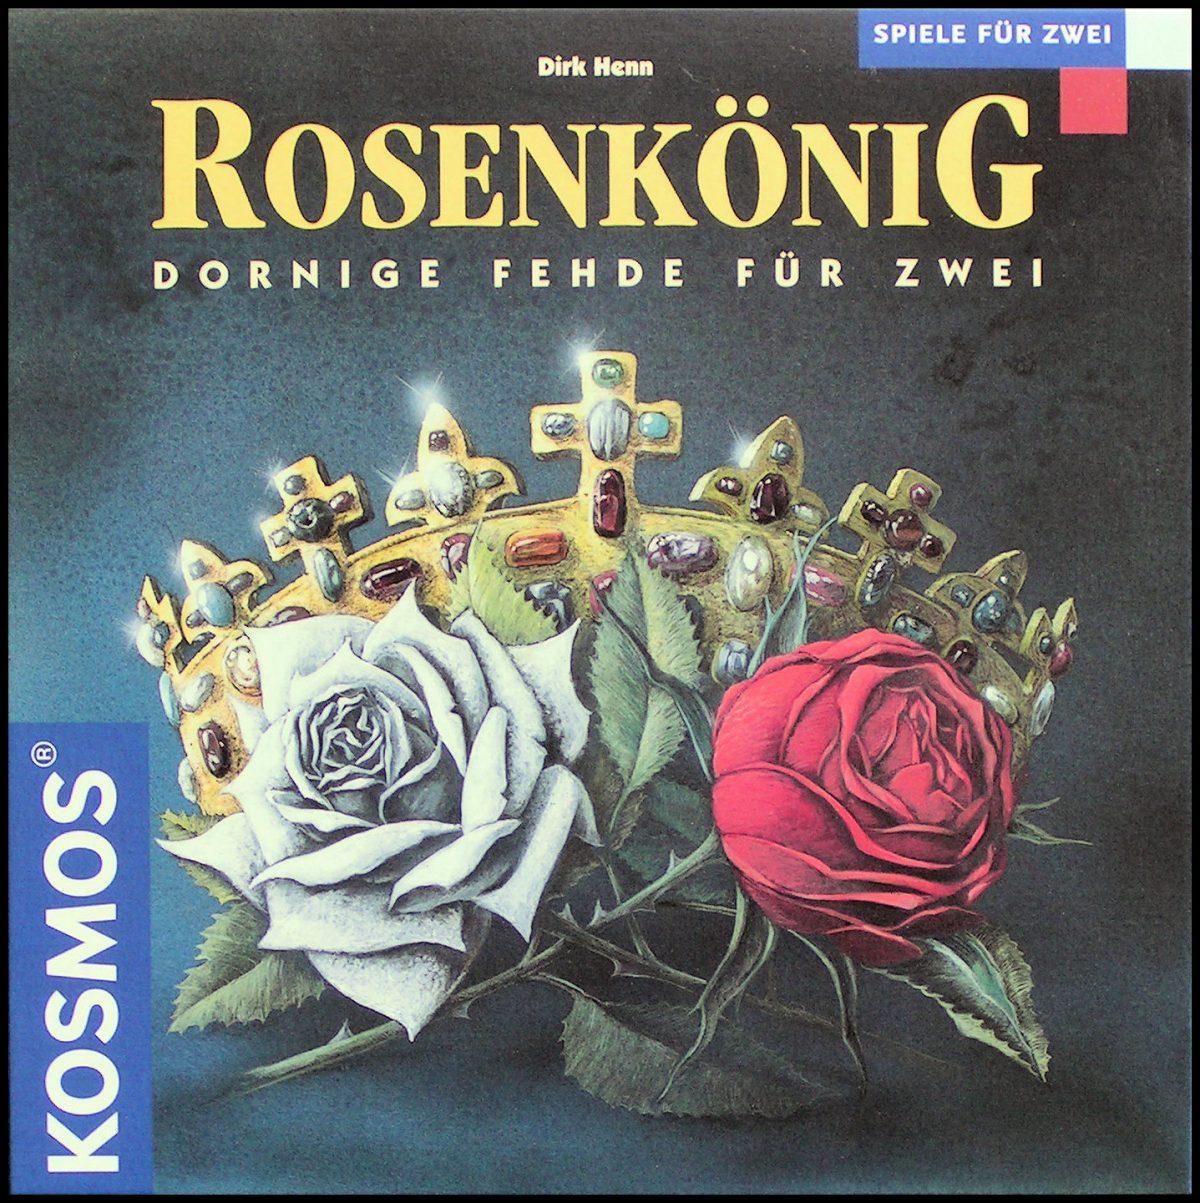 Rosenkoenig - Box Front